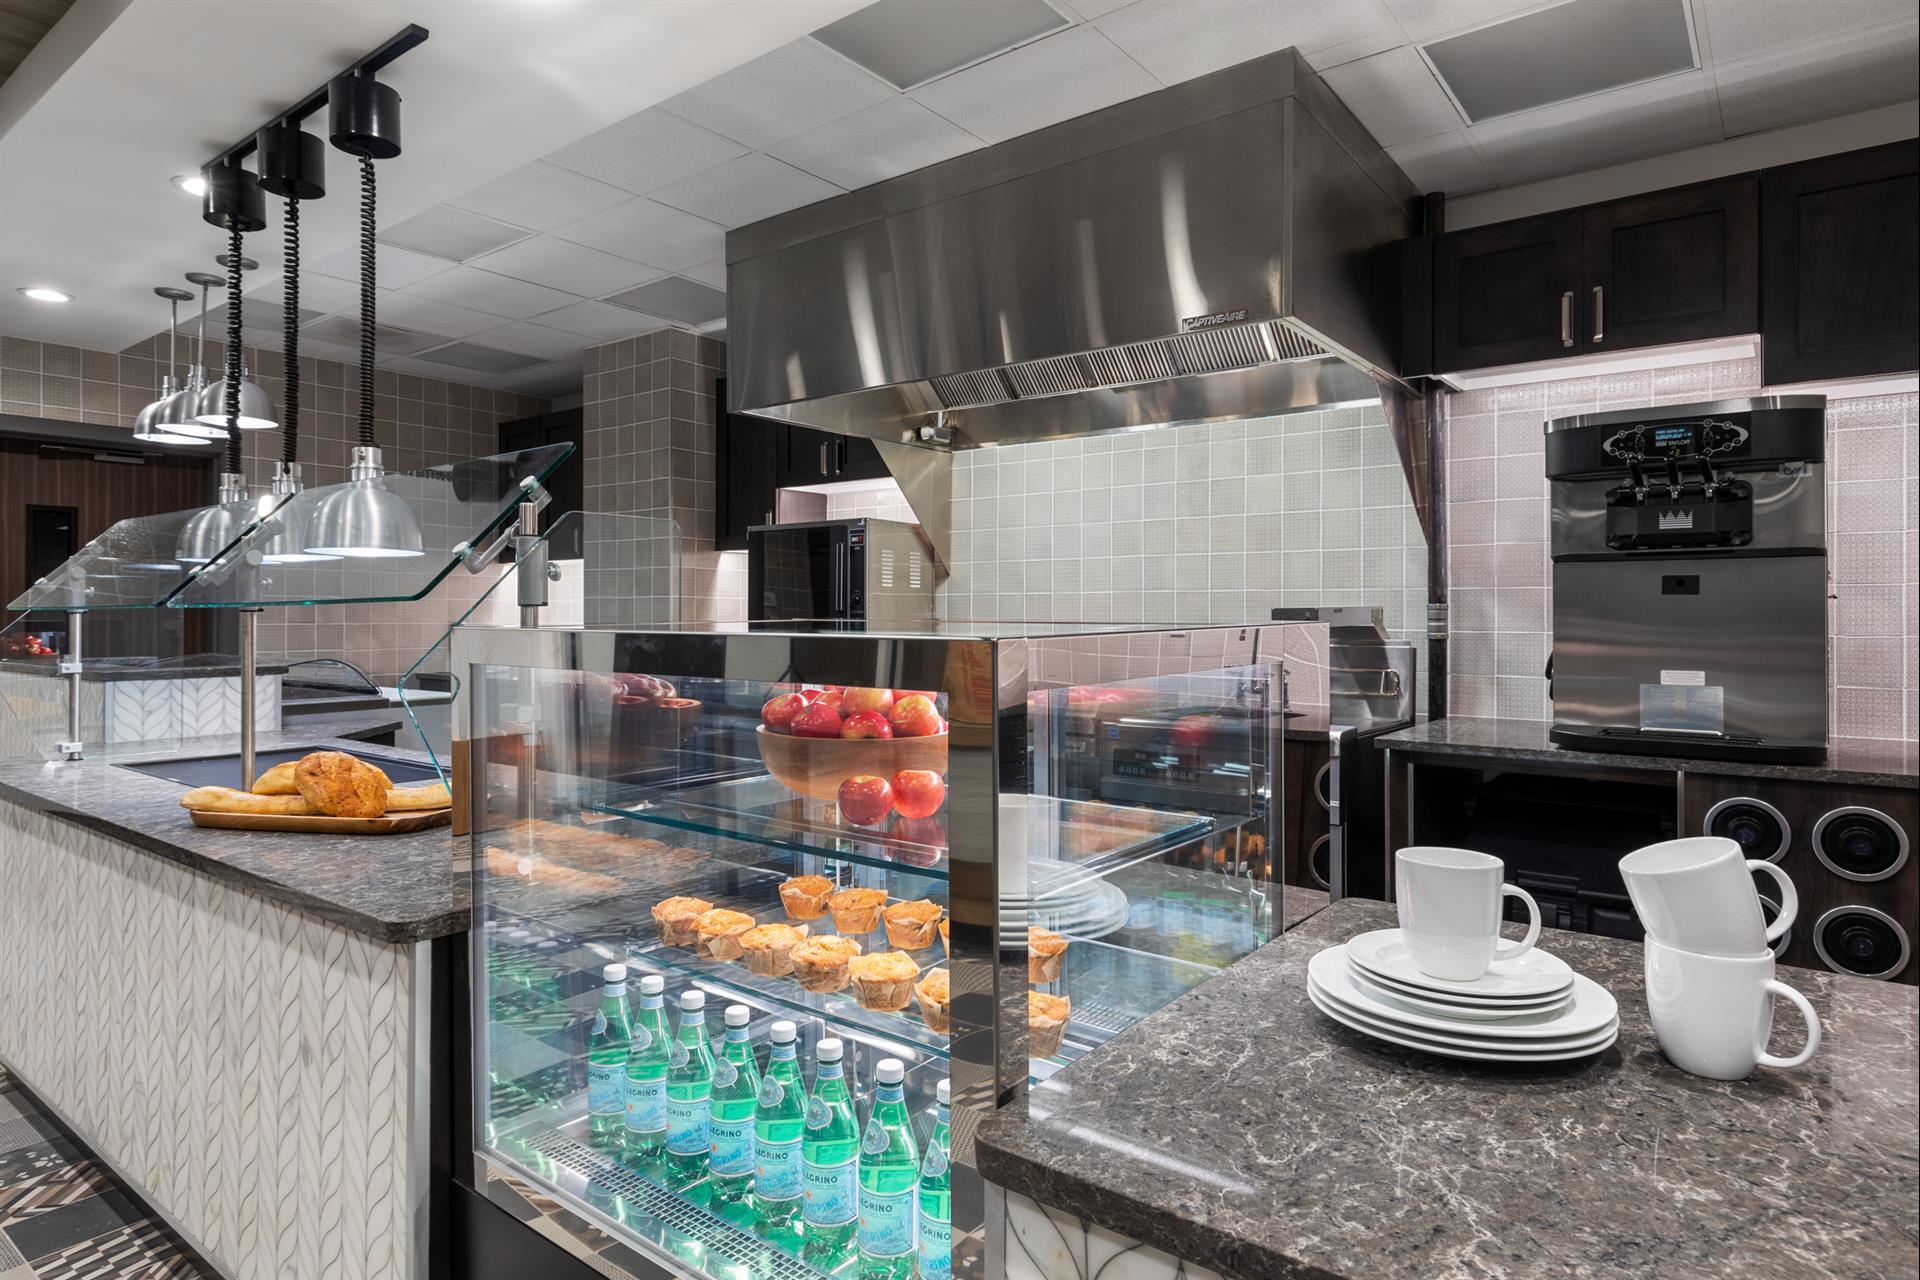 The kitchen inside The Vista